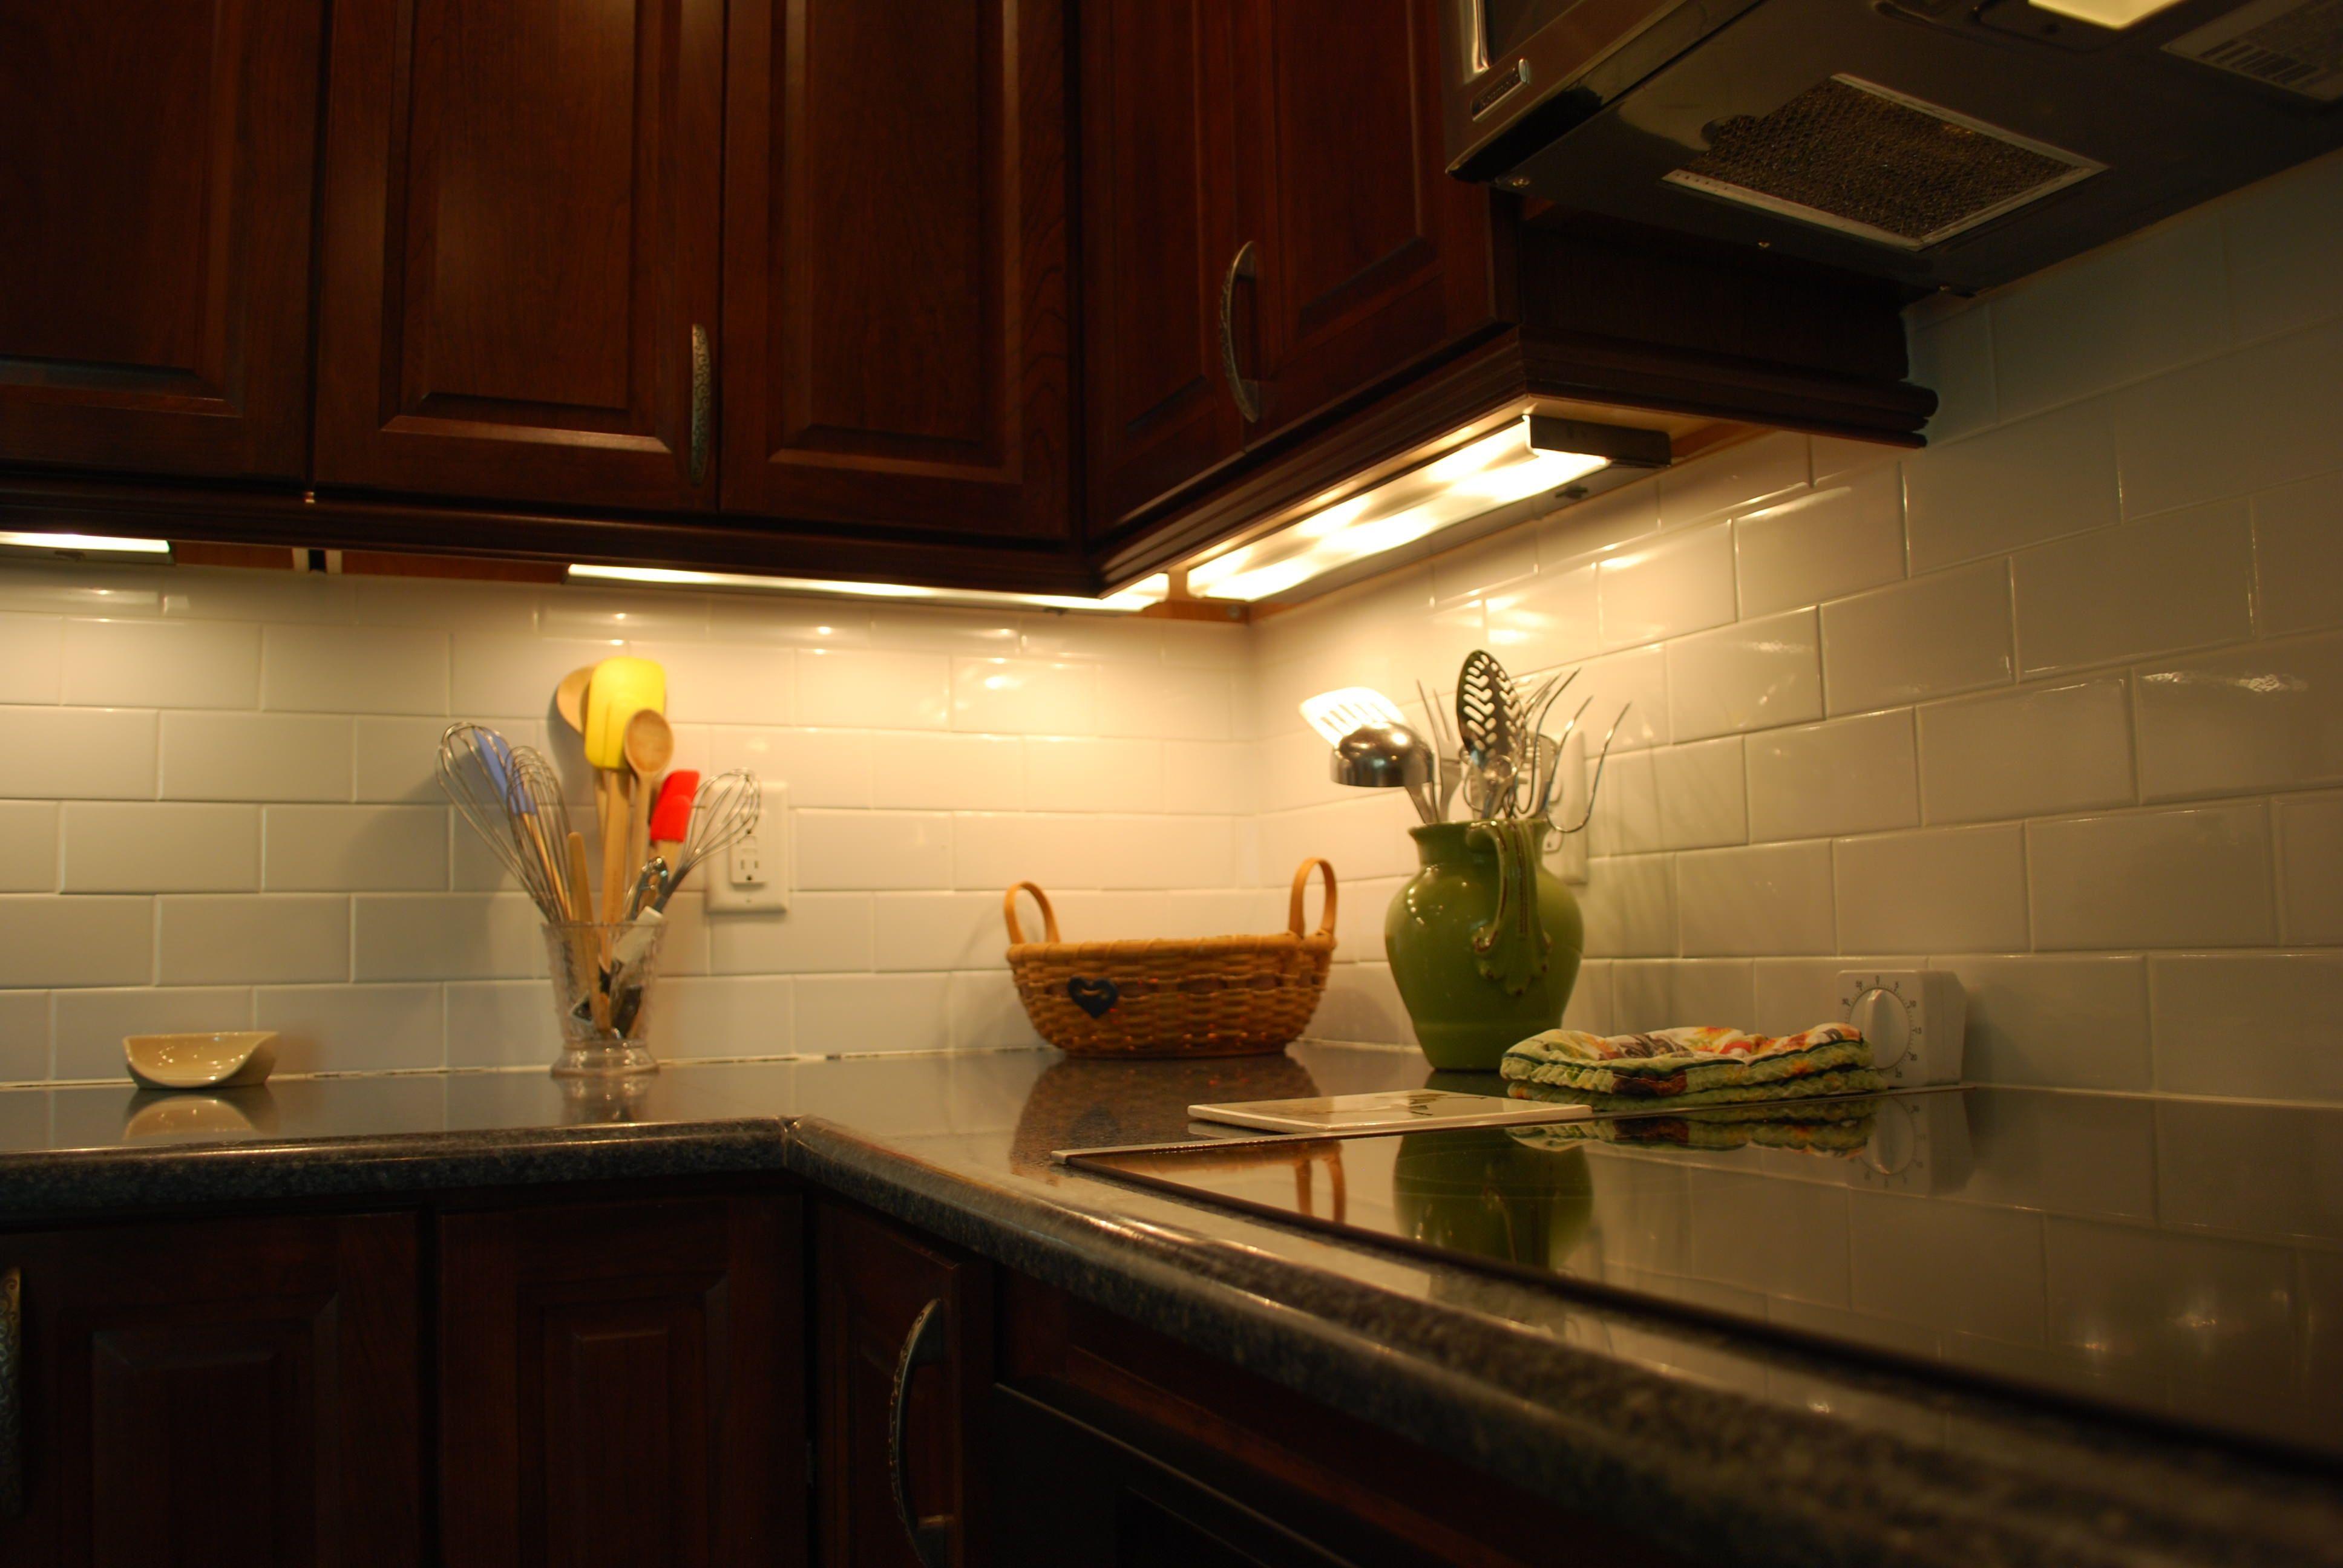 Utilitech under cabinet lighting xenon httpbetdaffaires utilitech under cabinet lighting xenon httpbetdaffaires pinterest aloadofball Gallery